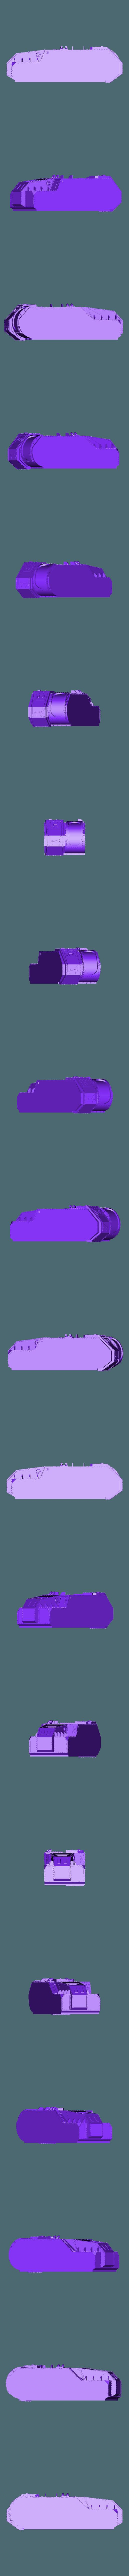 Hull.stl Download free STL file Sigilates Shooty Shooty Dakka Defense Boat • Design to 3D print, danny_cyanide